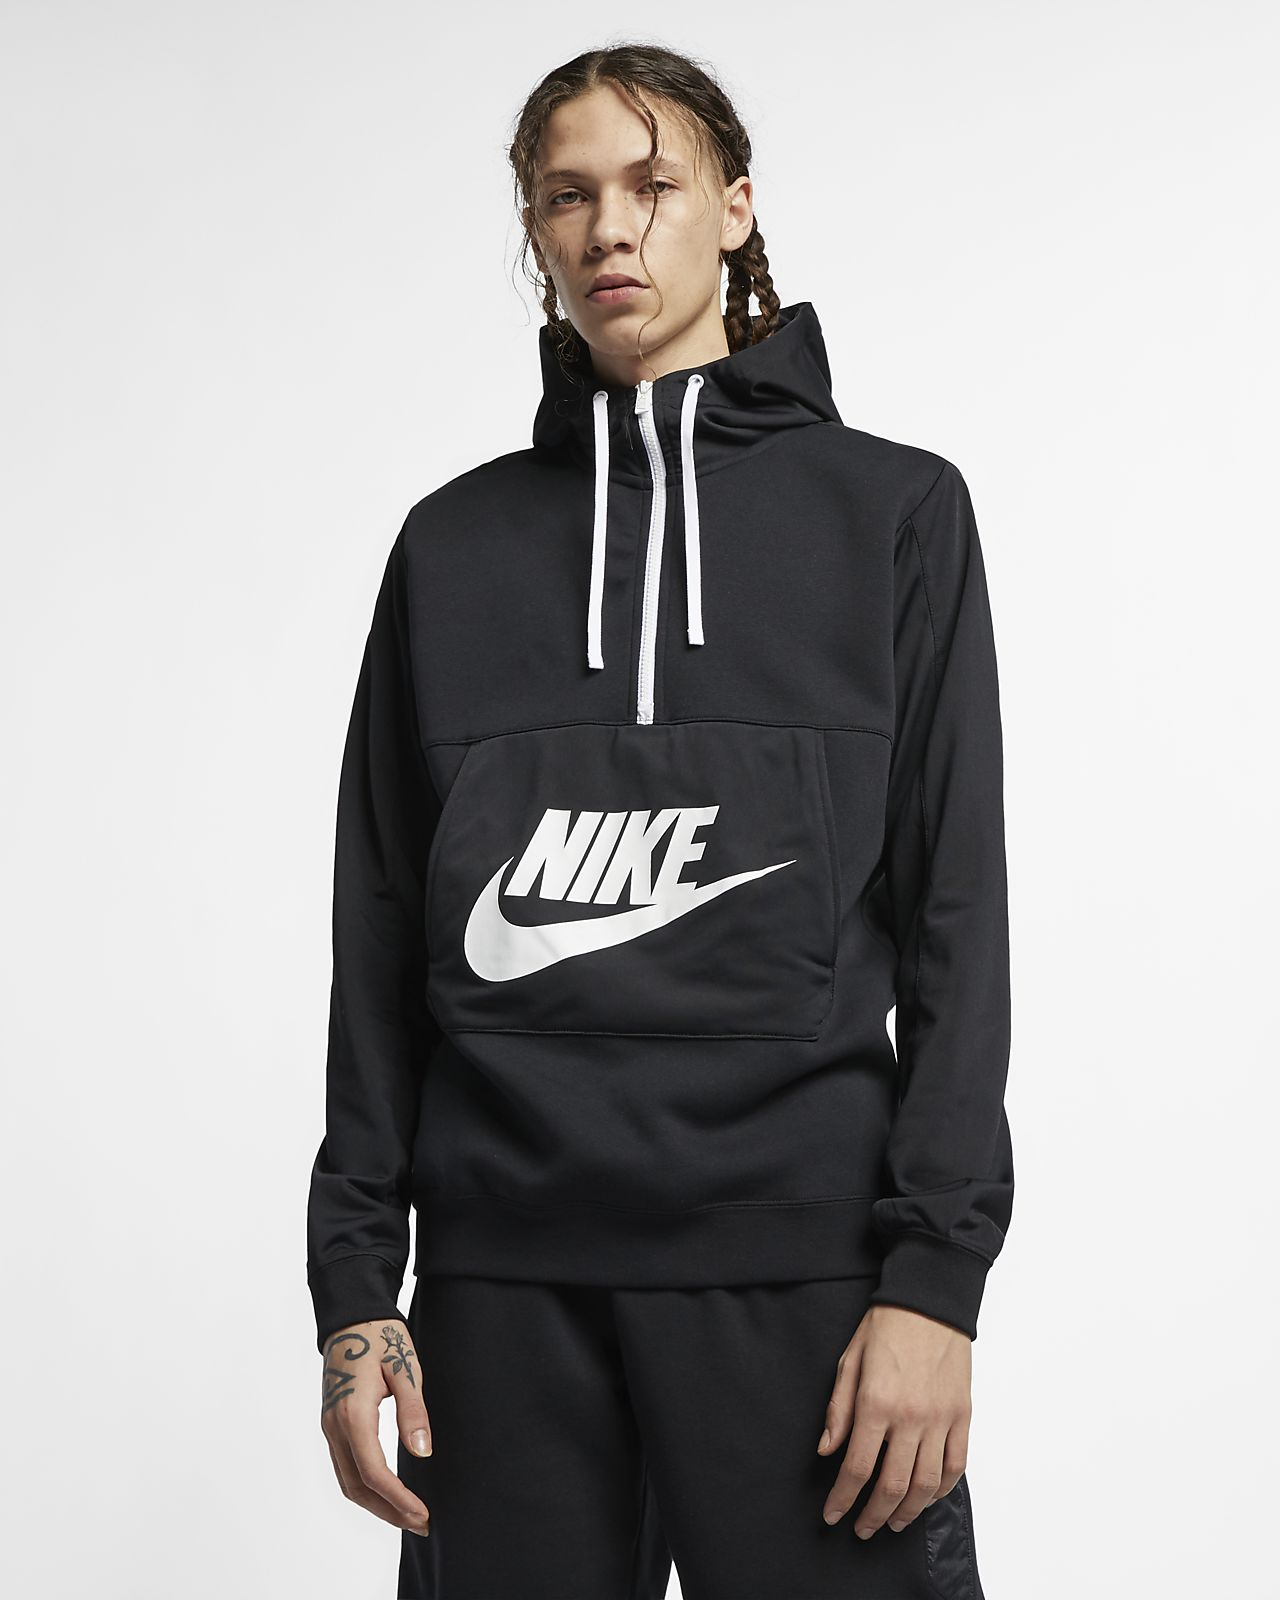 Nike Sportswear rövid cipzáras, kapucnis férfipulóver